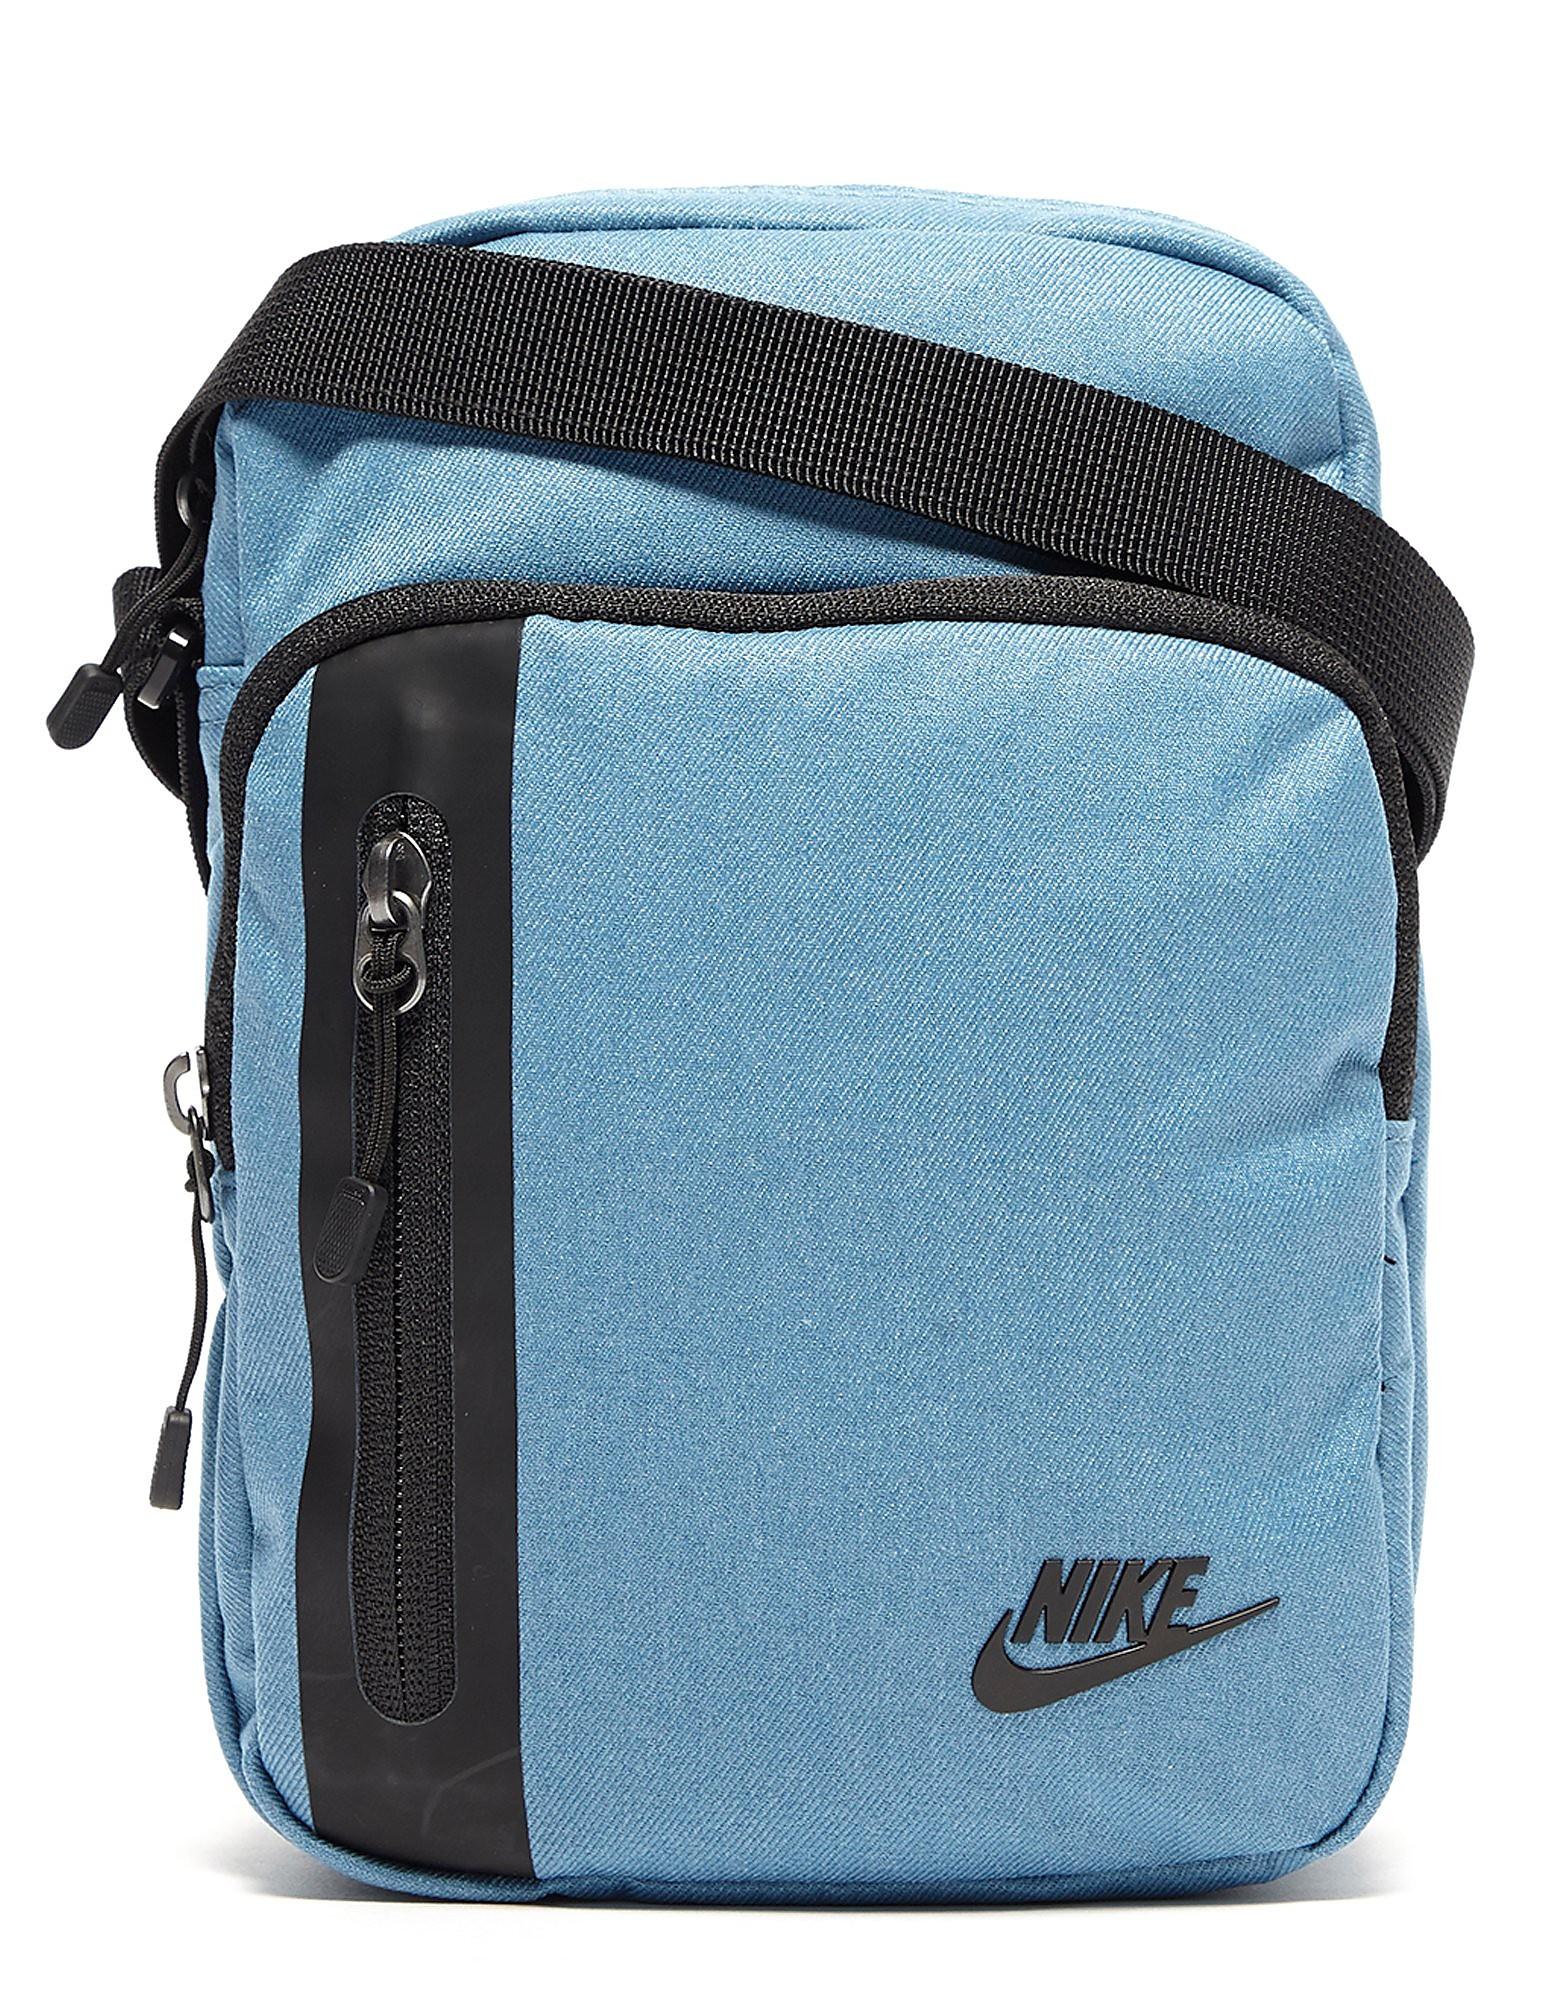 Nike mochila Core Small 3.0